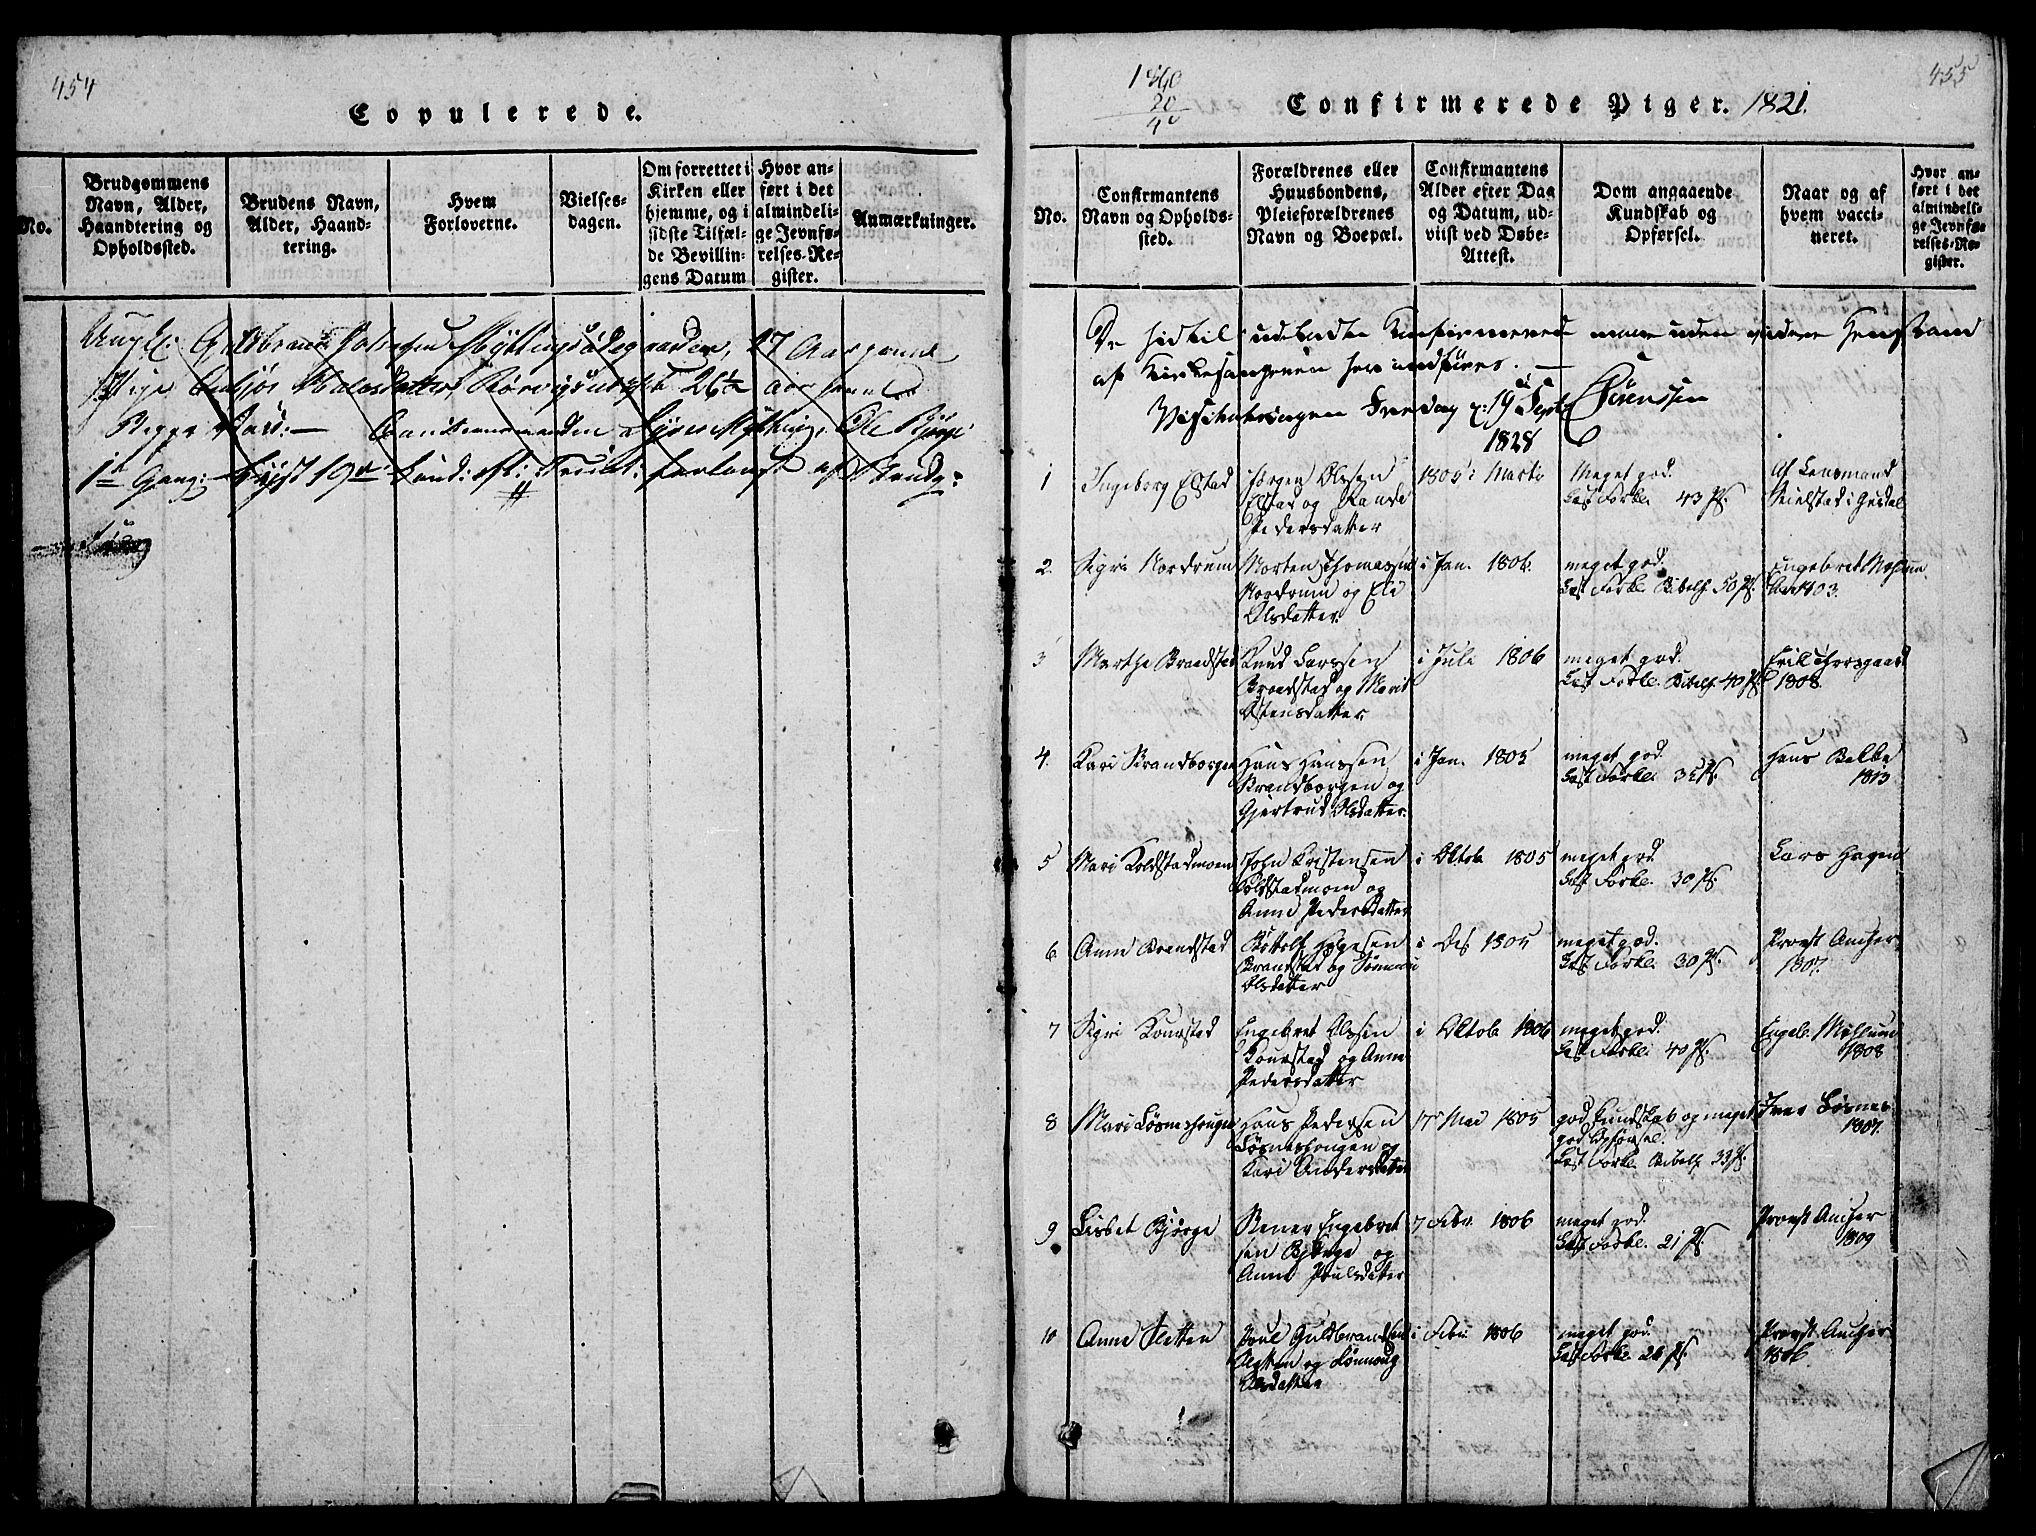 SAH, Ringebu prestekontor, Klokkerbok nr. 1, 1821-1839, s. 454-455